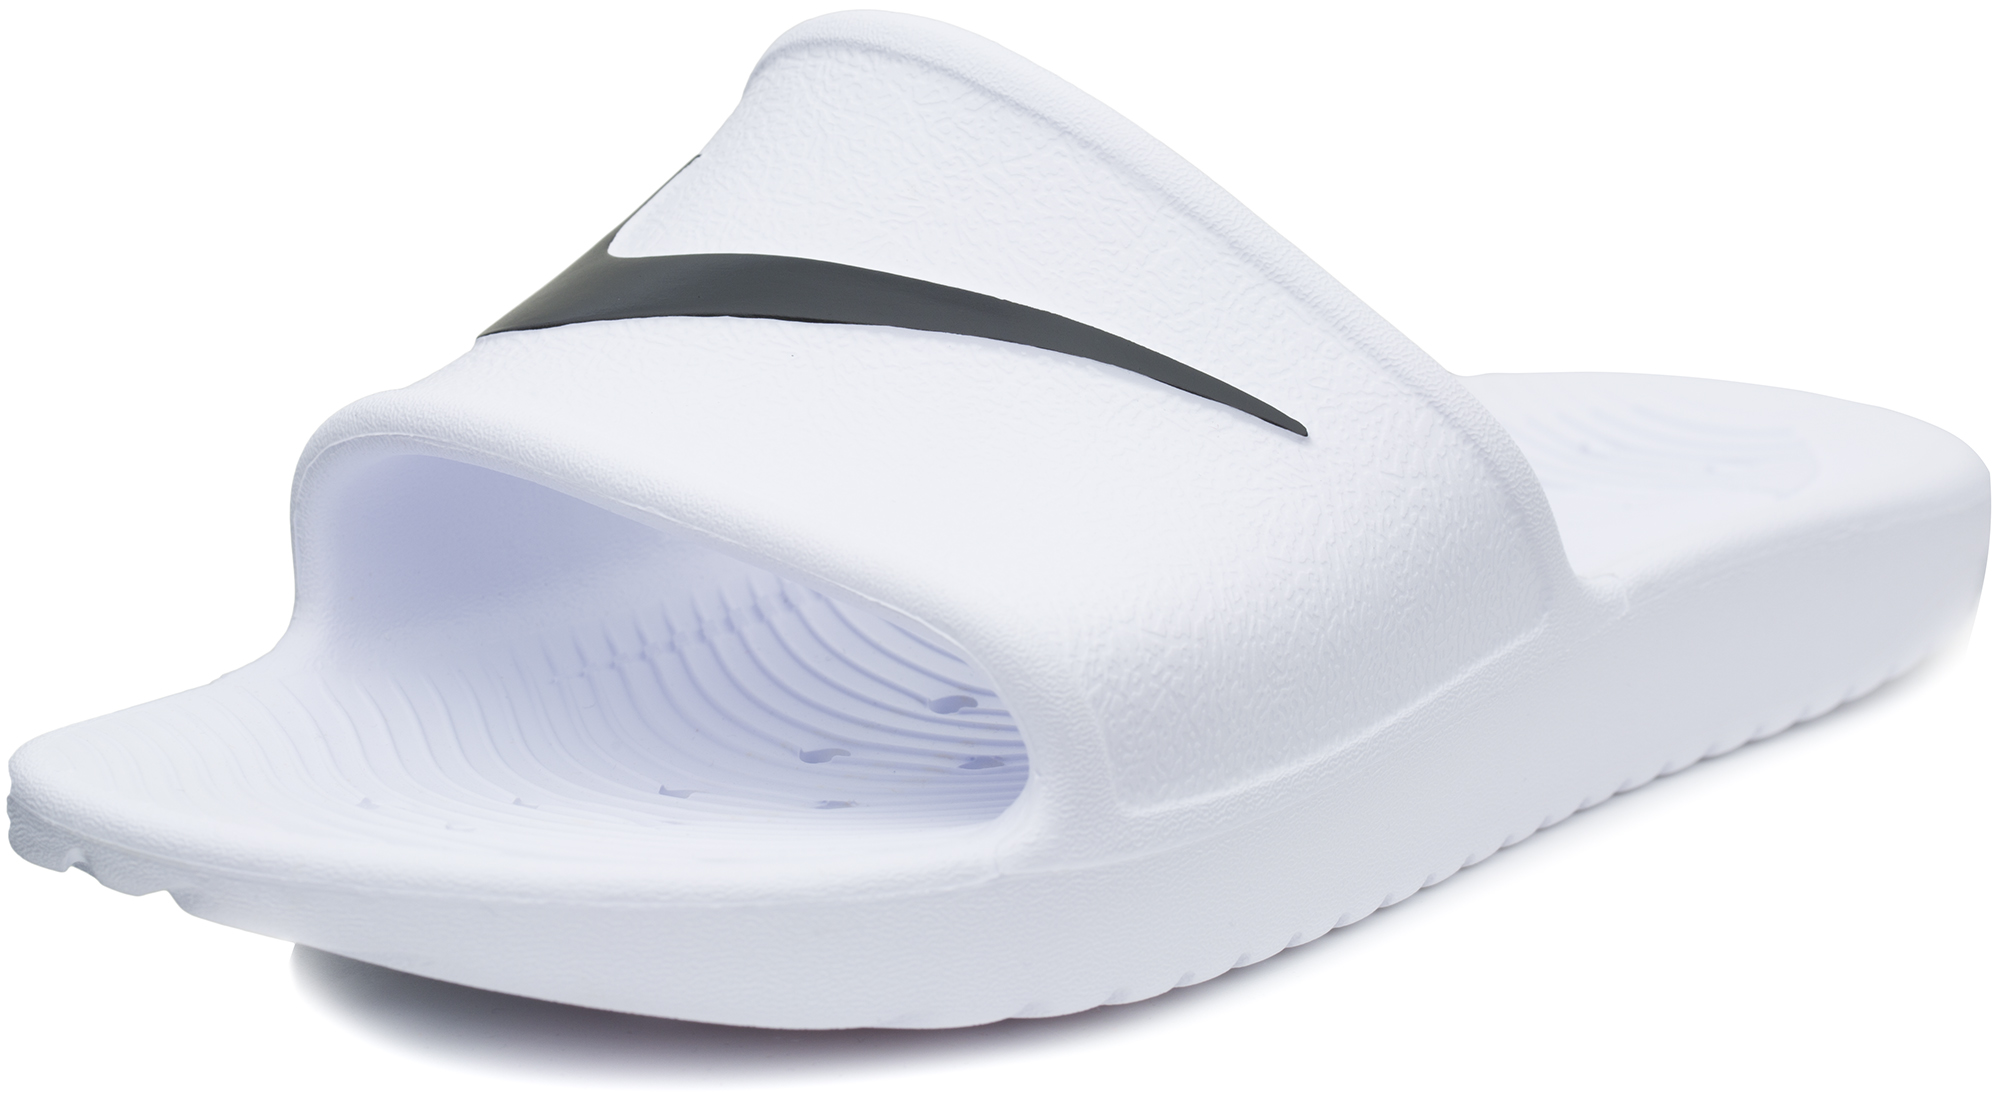 Nike Шлепанцы женские Nike Kawa Shower, размер 39,5 цена